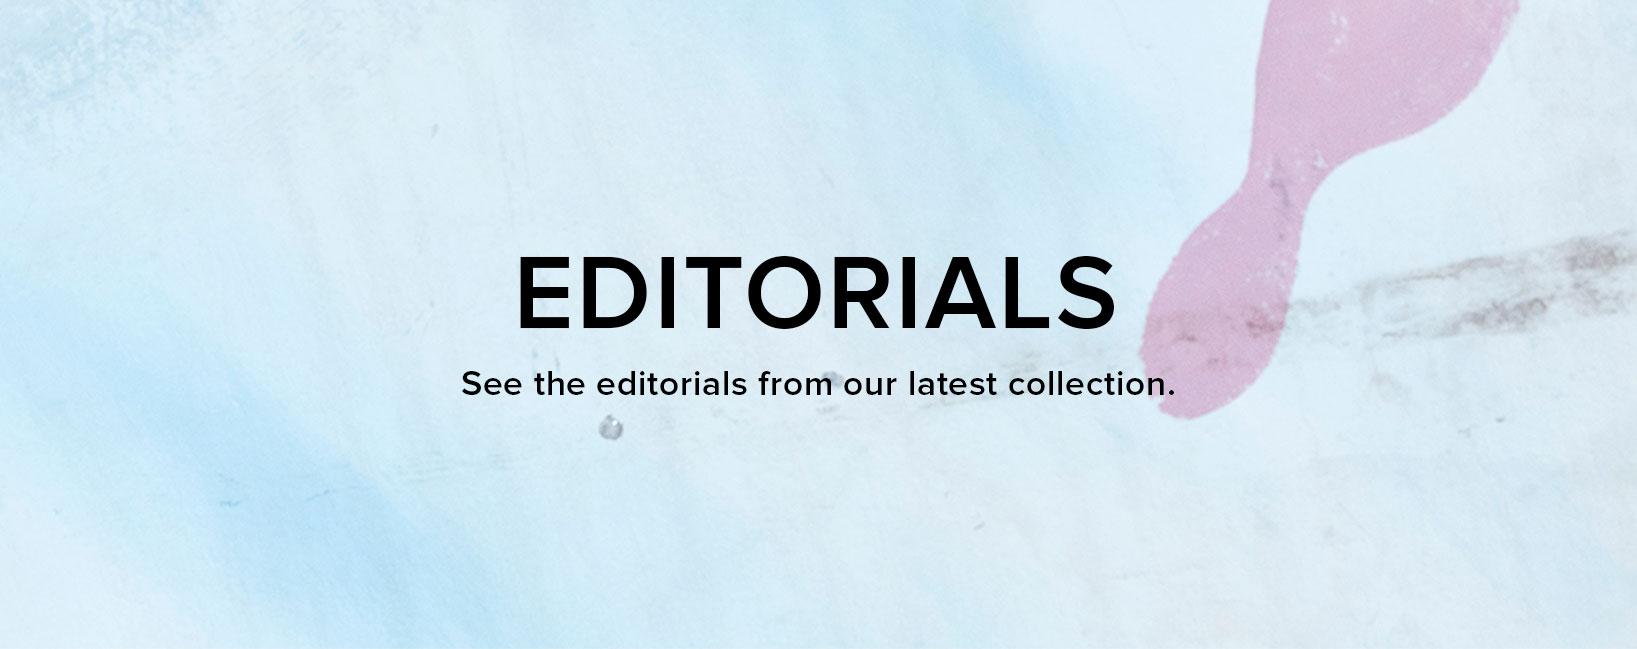 Top Banner Editorials